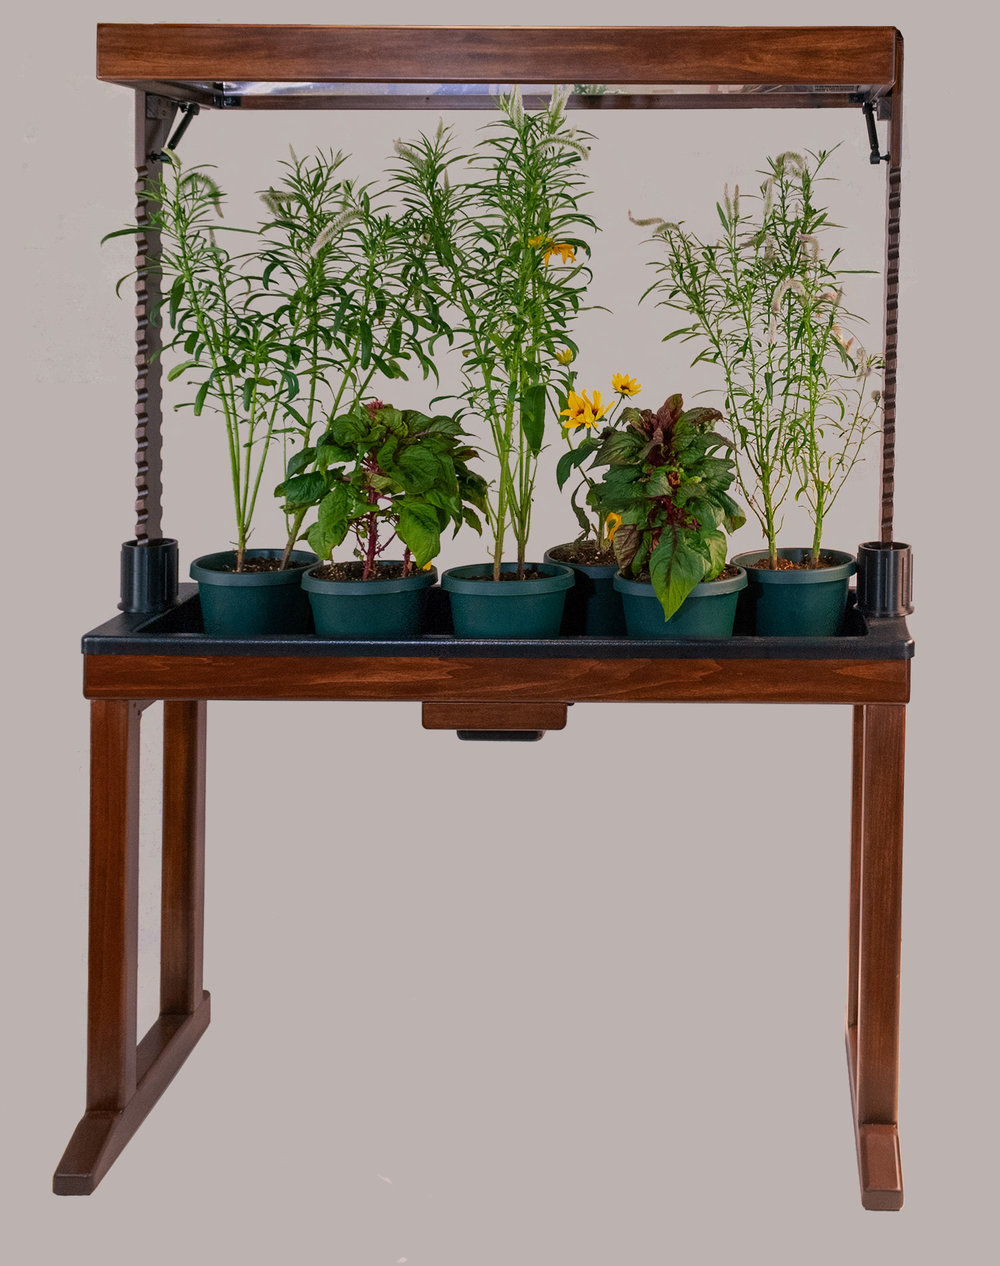 BloomInLight with Celosia Spicata, Celosia Plumosa, and Rudbeckia